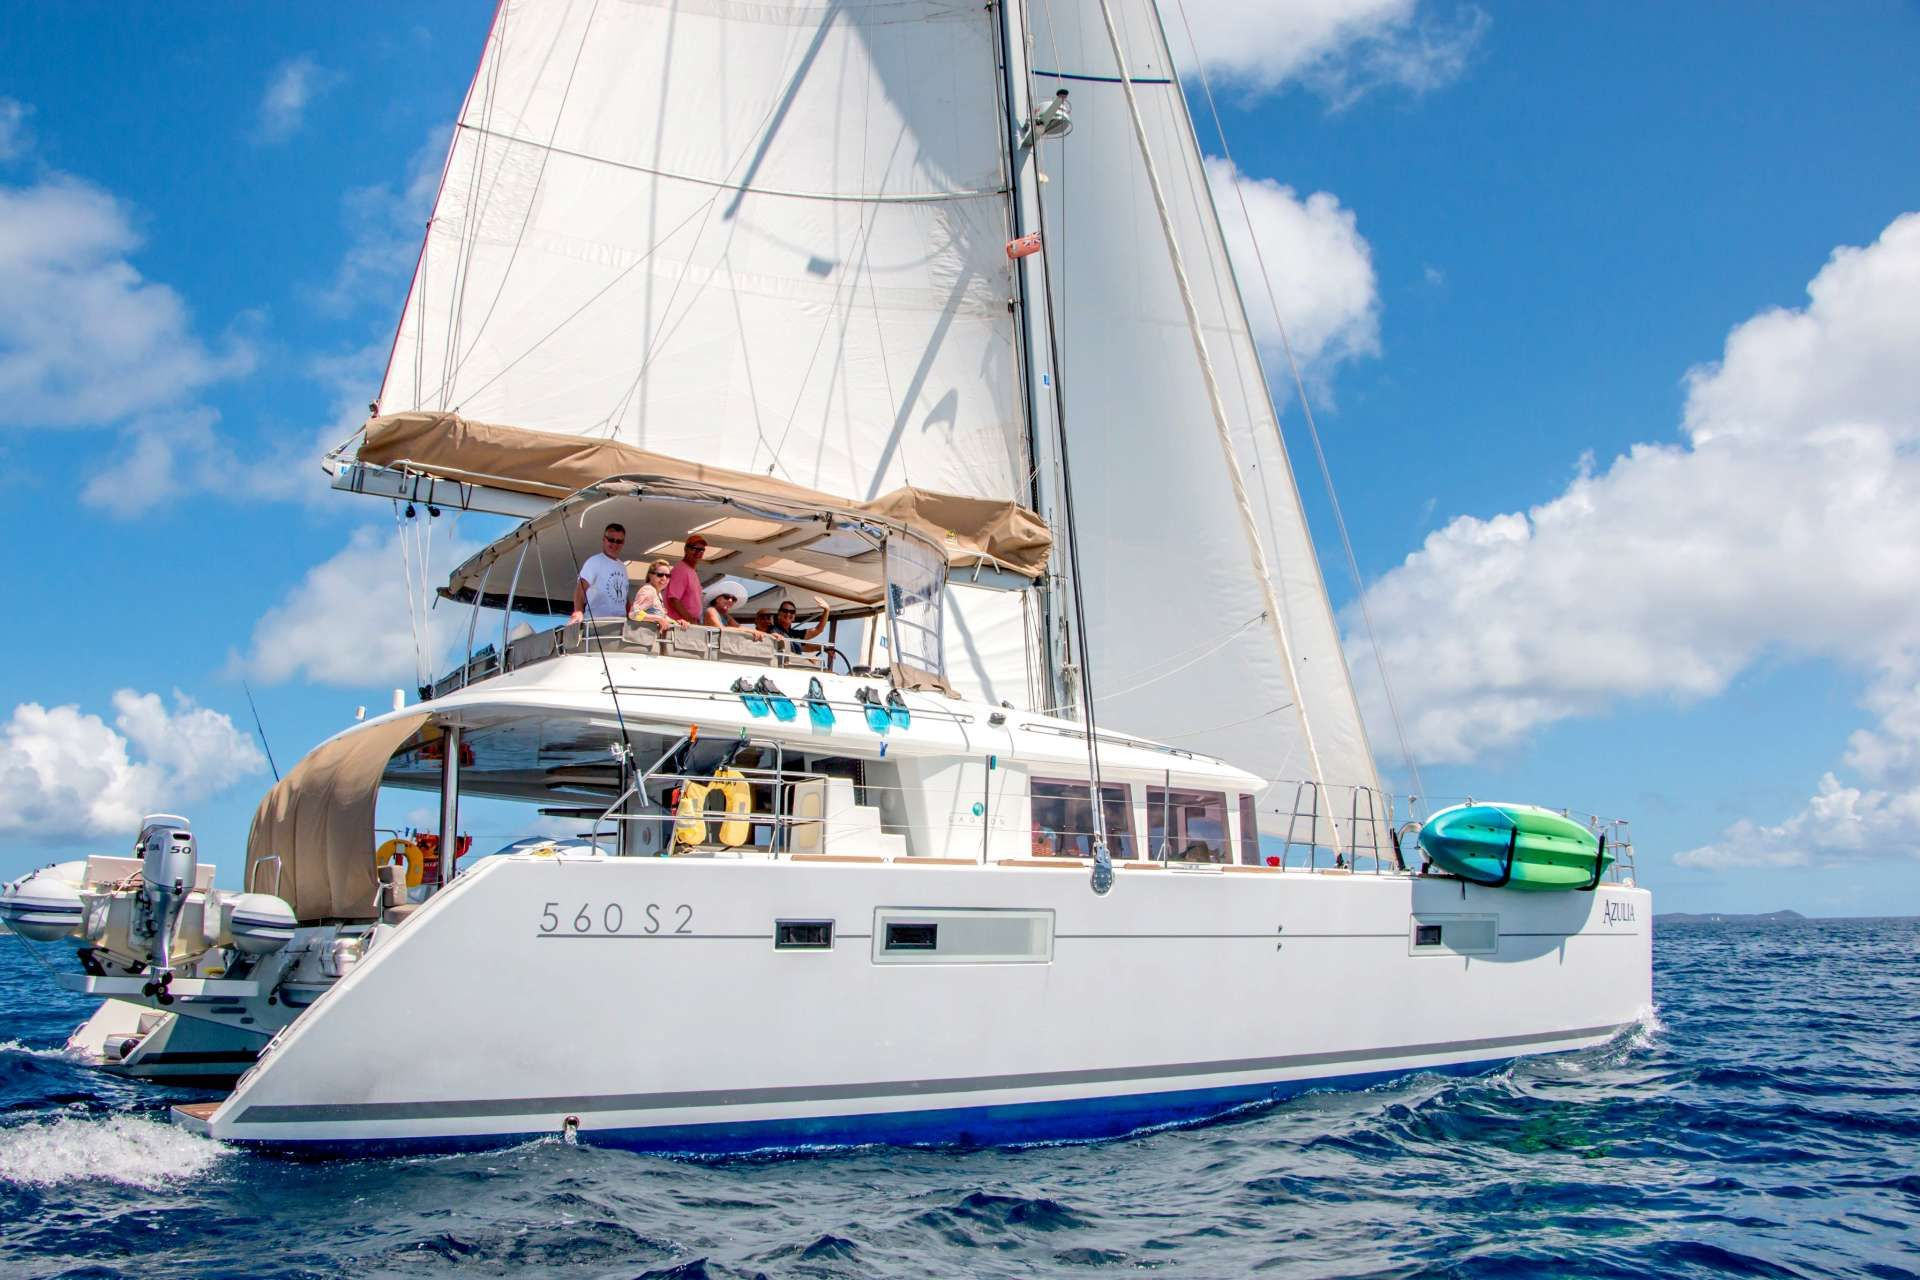 AZULIA II - Lagoon 560 S2 - 4 Cabins - St Thomas - St John - Virgin Islands